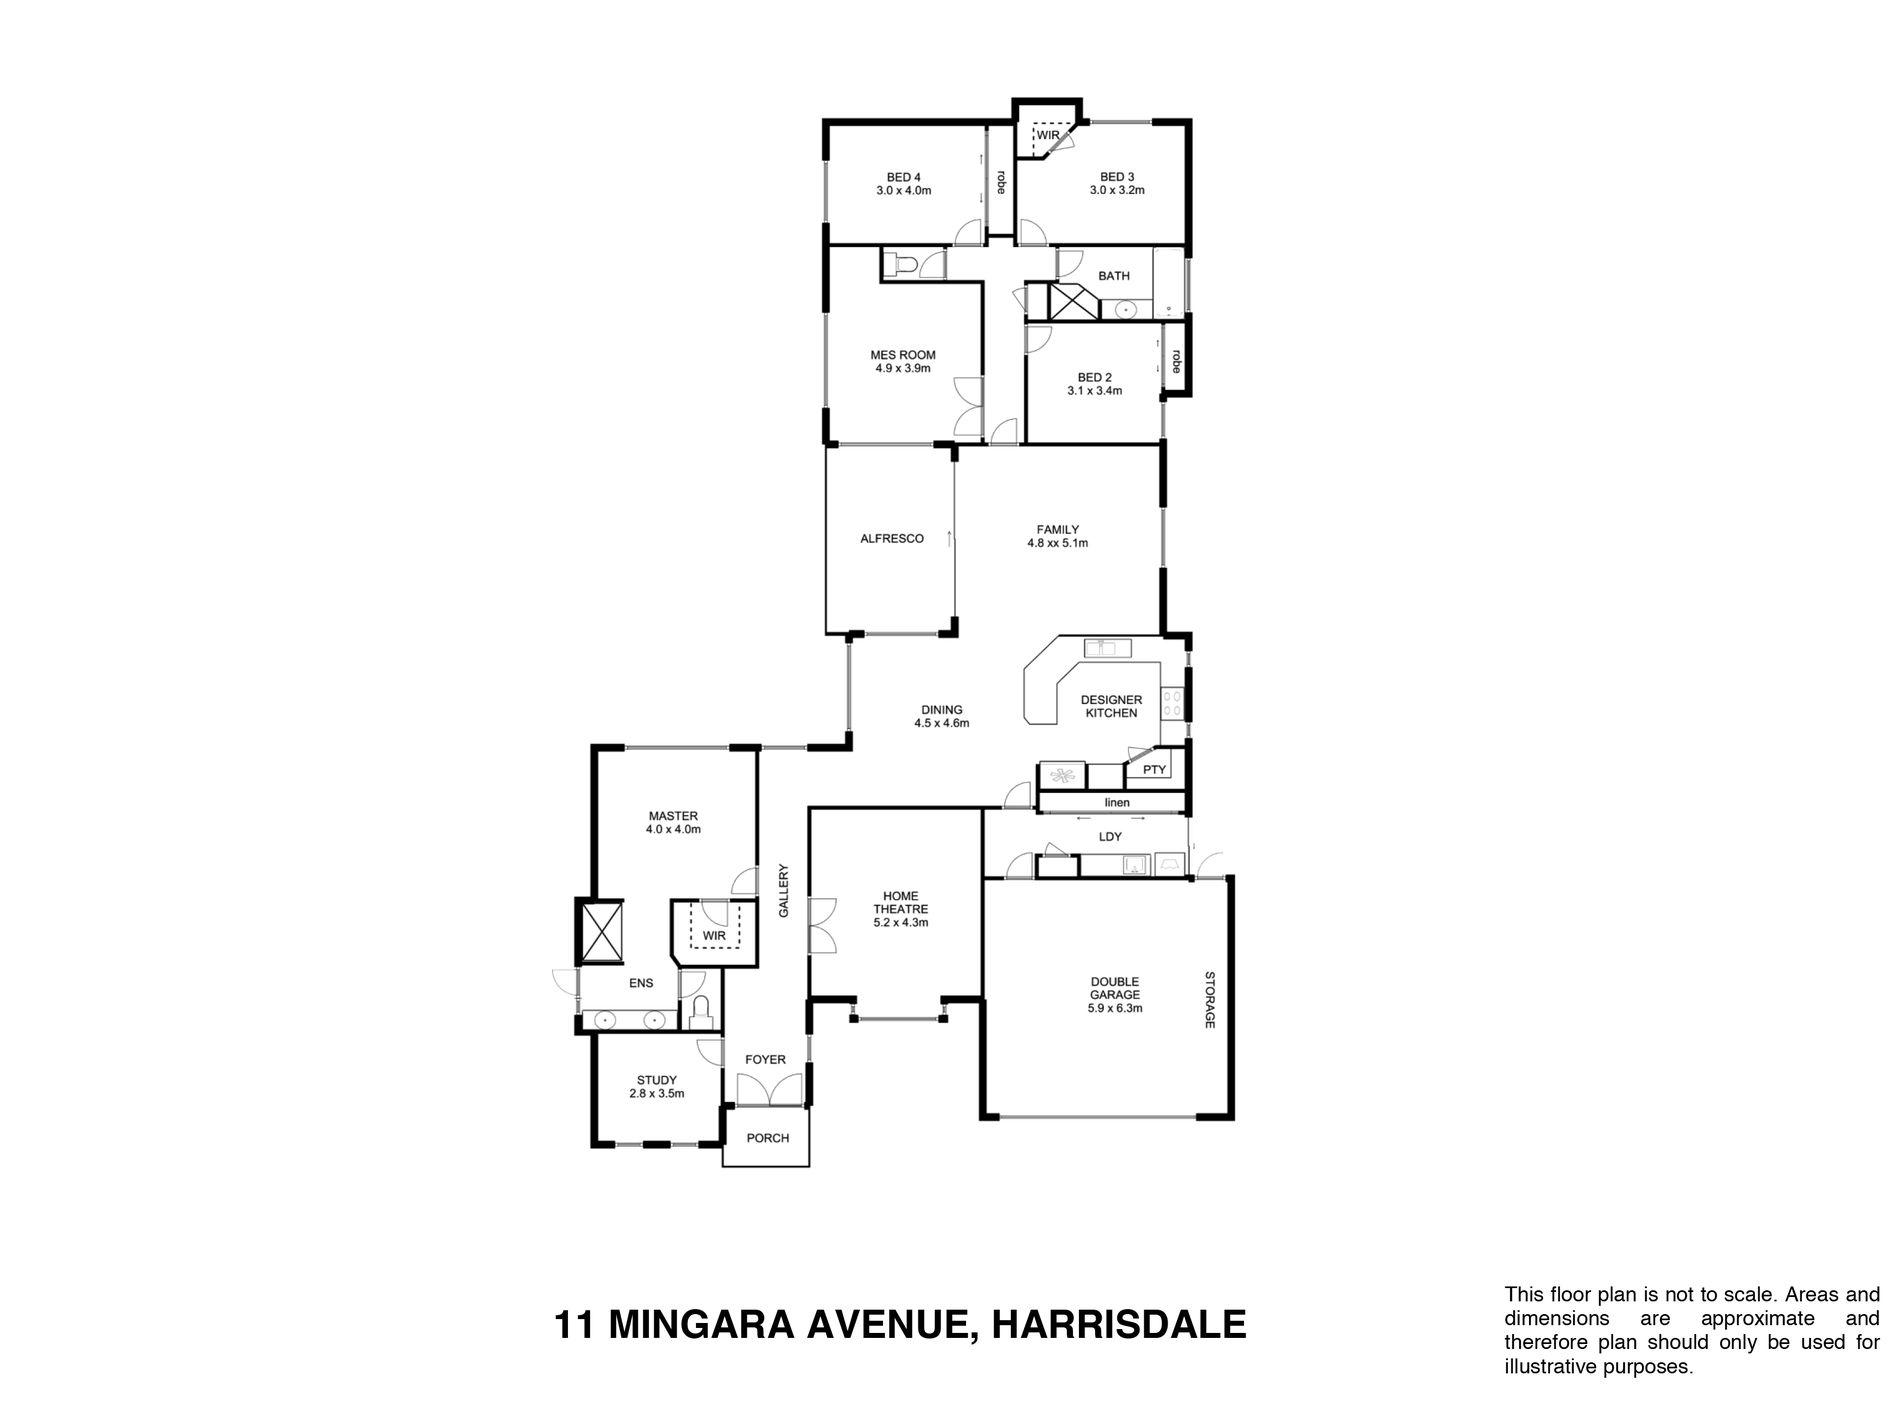 11 Mingara Avenue, Harrisdale